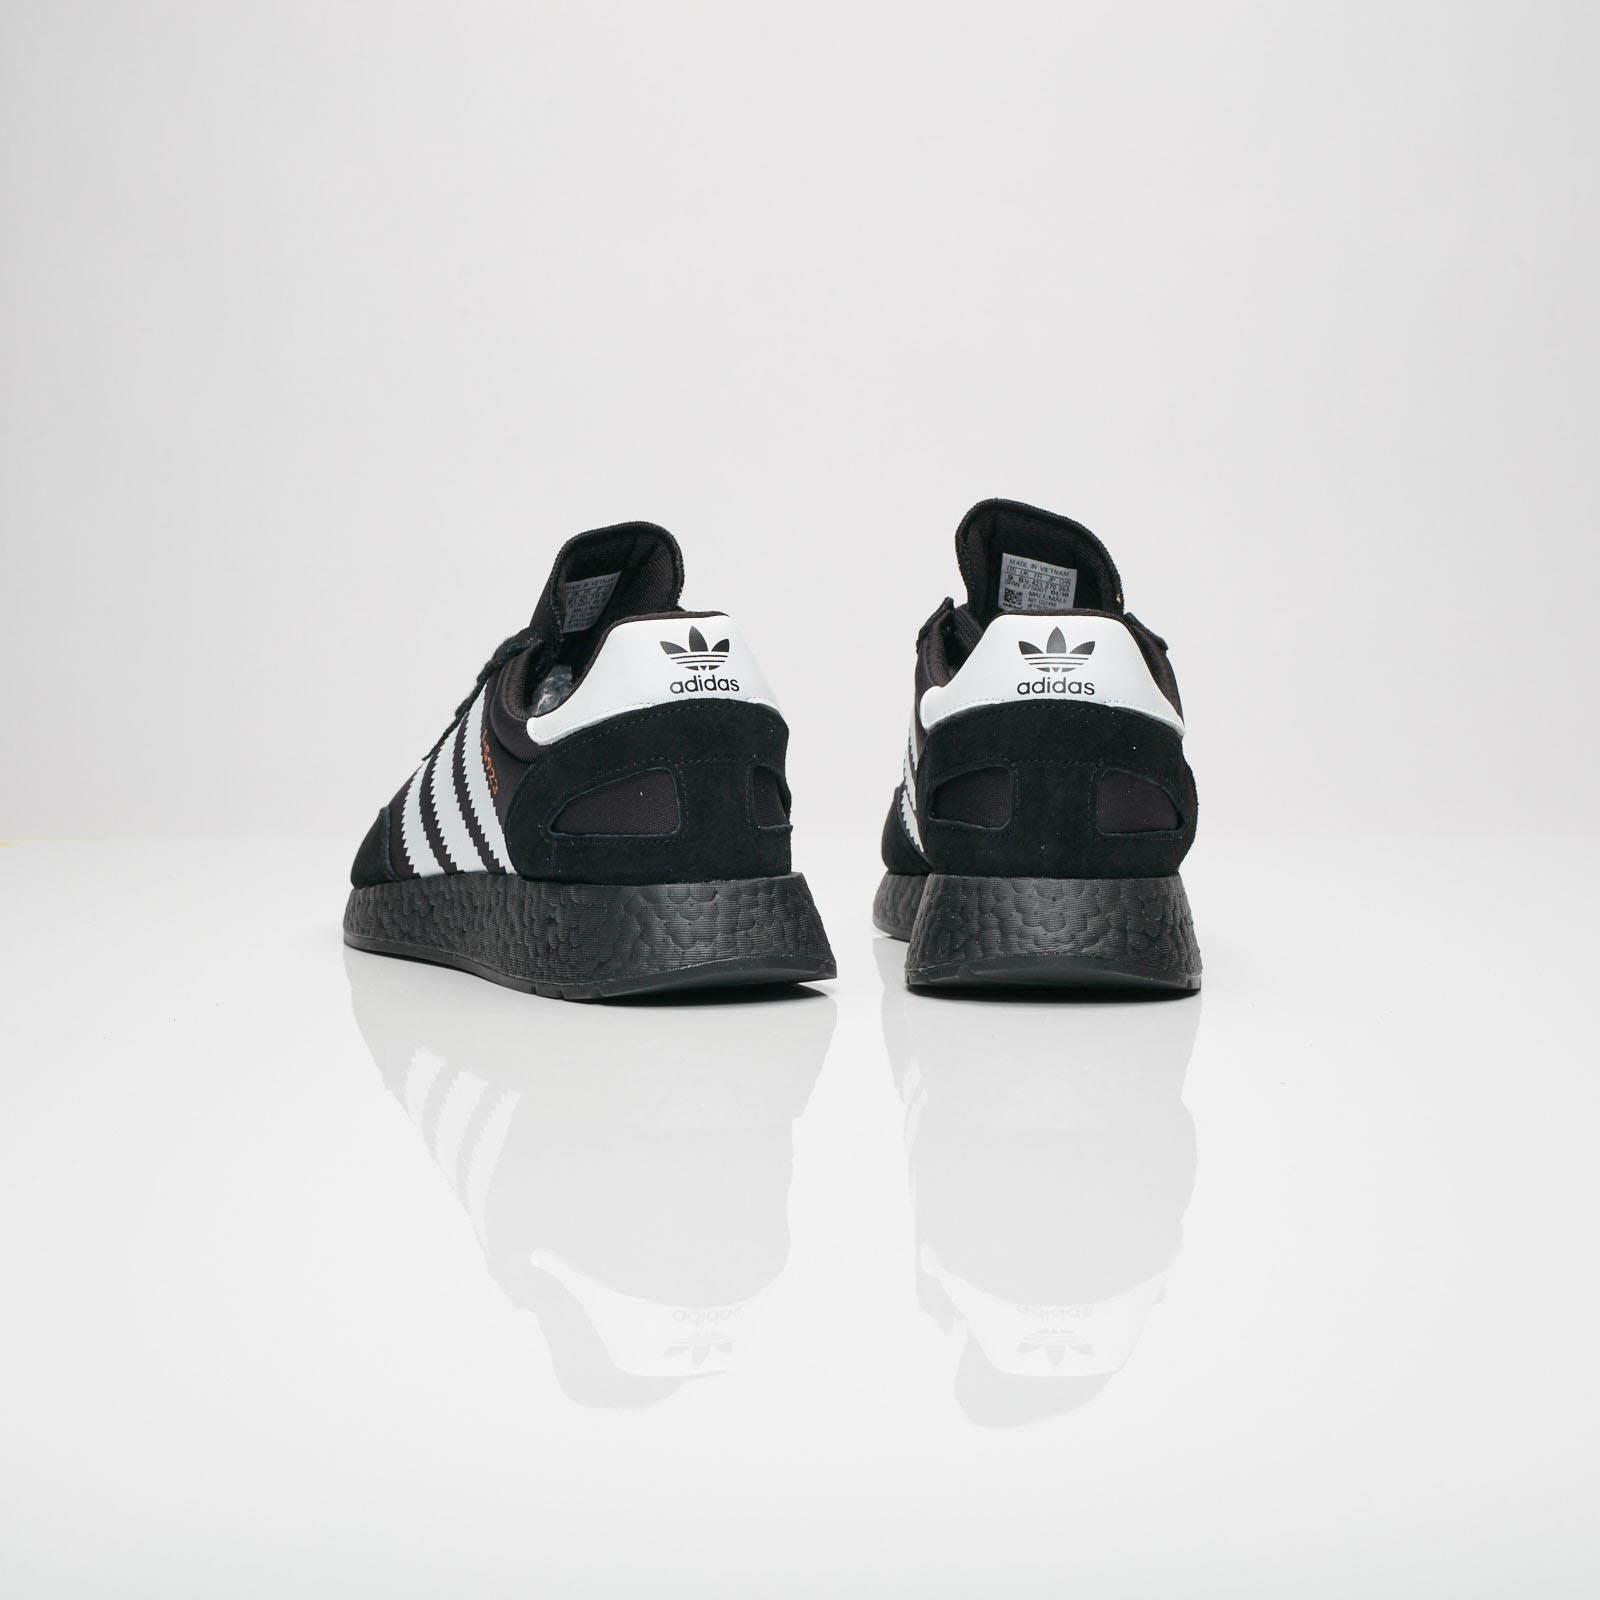 3392957ae adidas I-5923 - Cq2490 - Sneakersnstuff